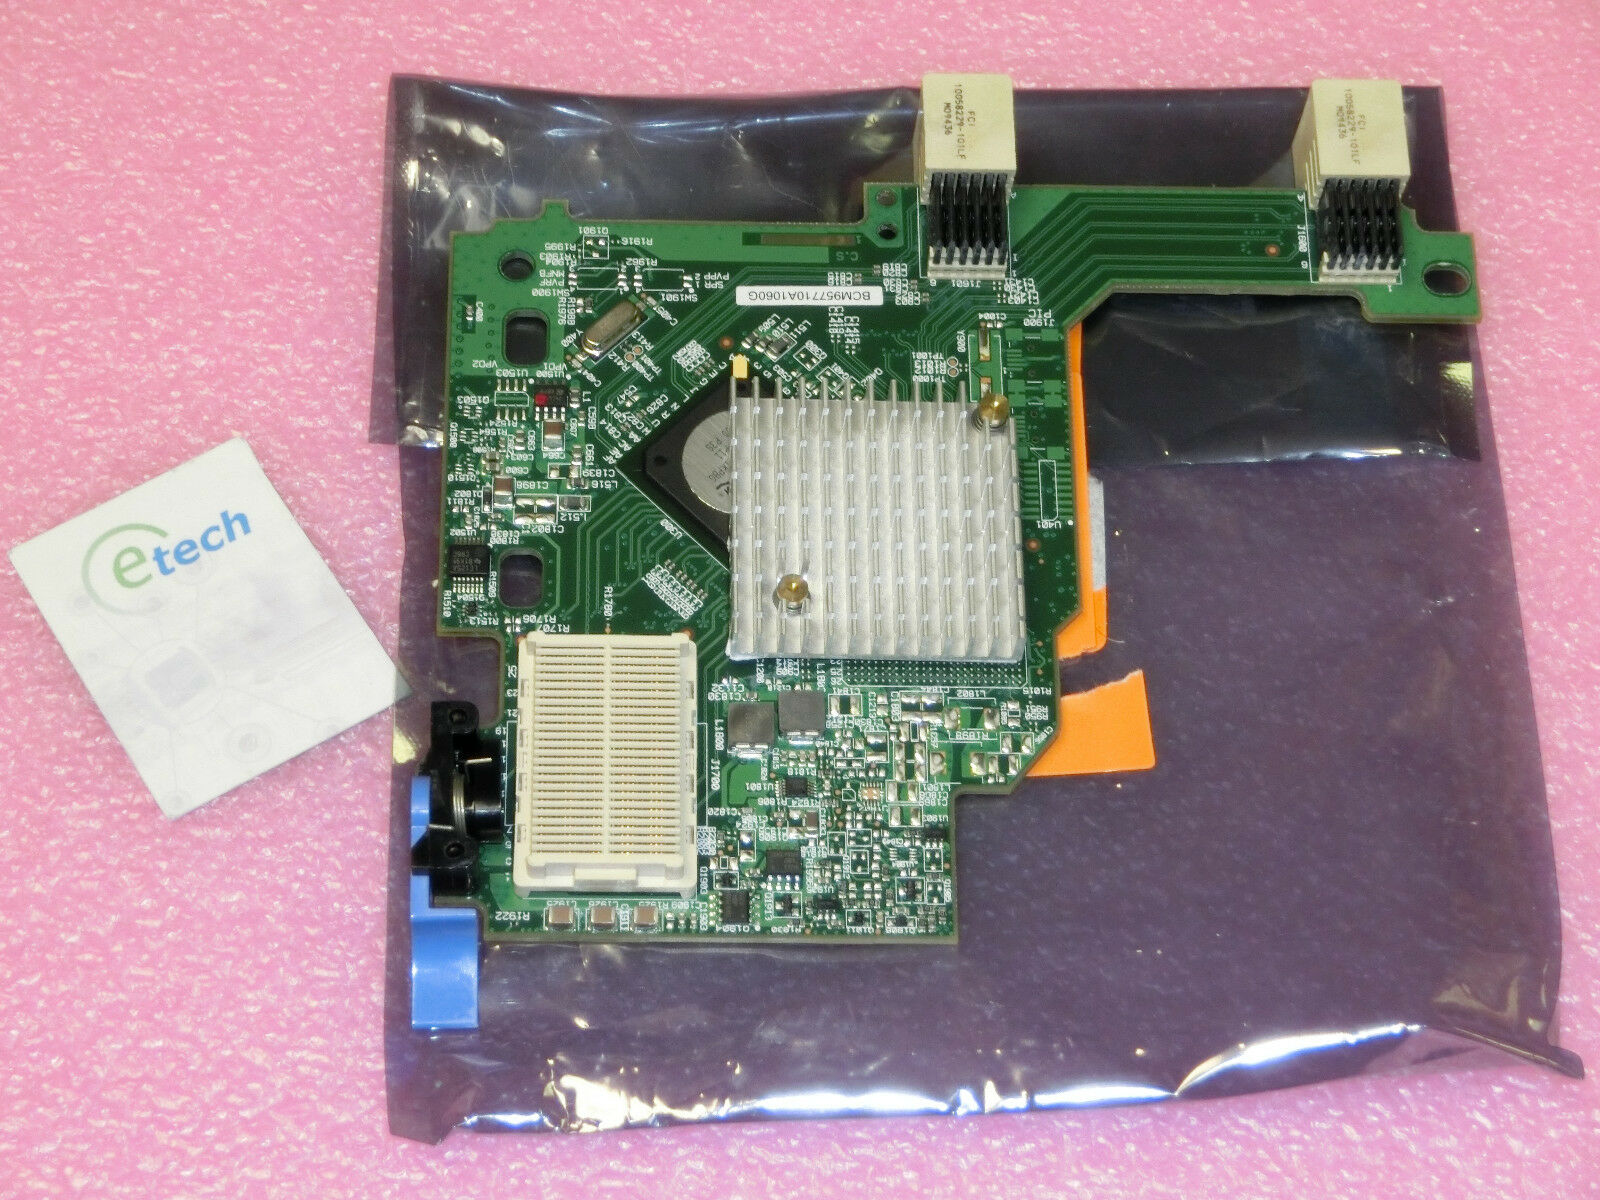 44W4466 - IBM Broadcom Dual-Port 10 Gigabit Ethernet Card CFFH HS22, FRU 44W4469